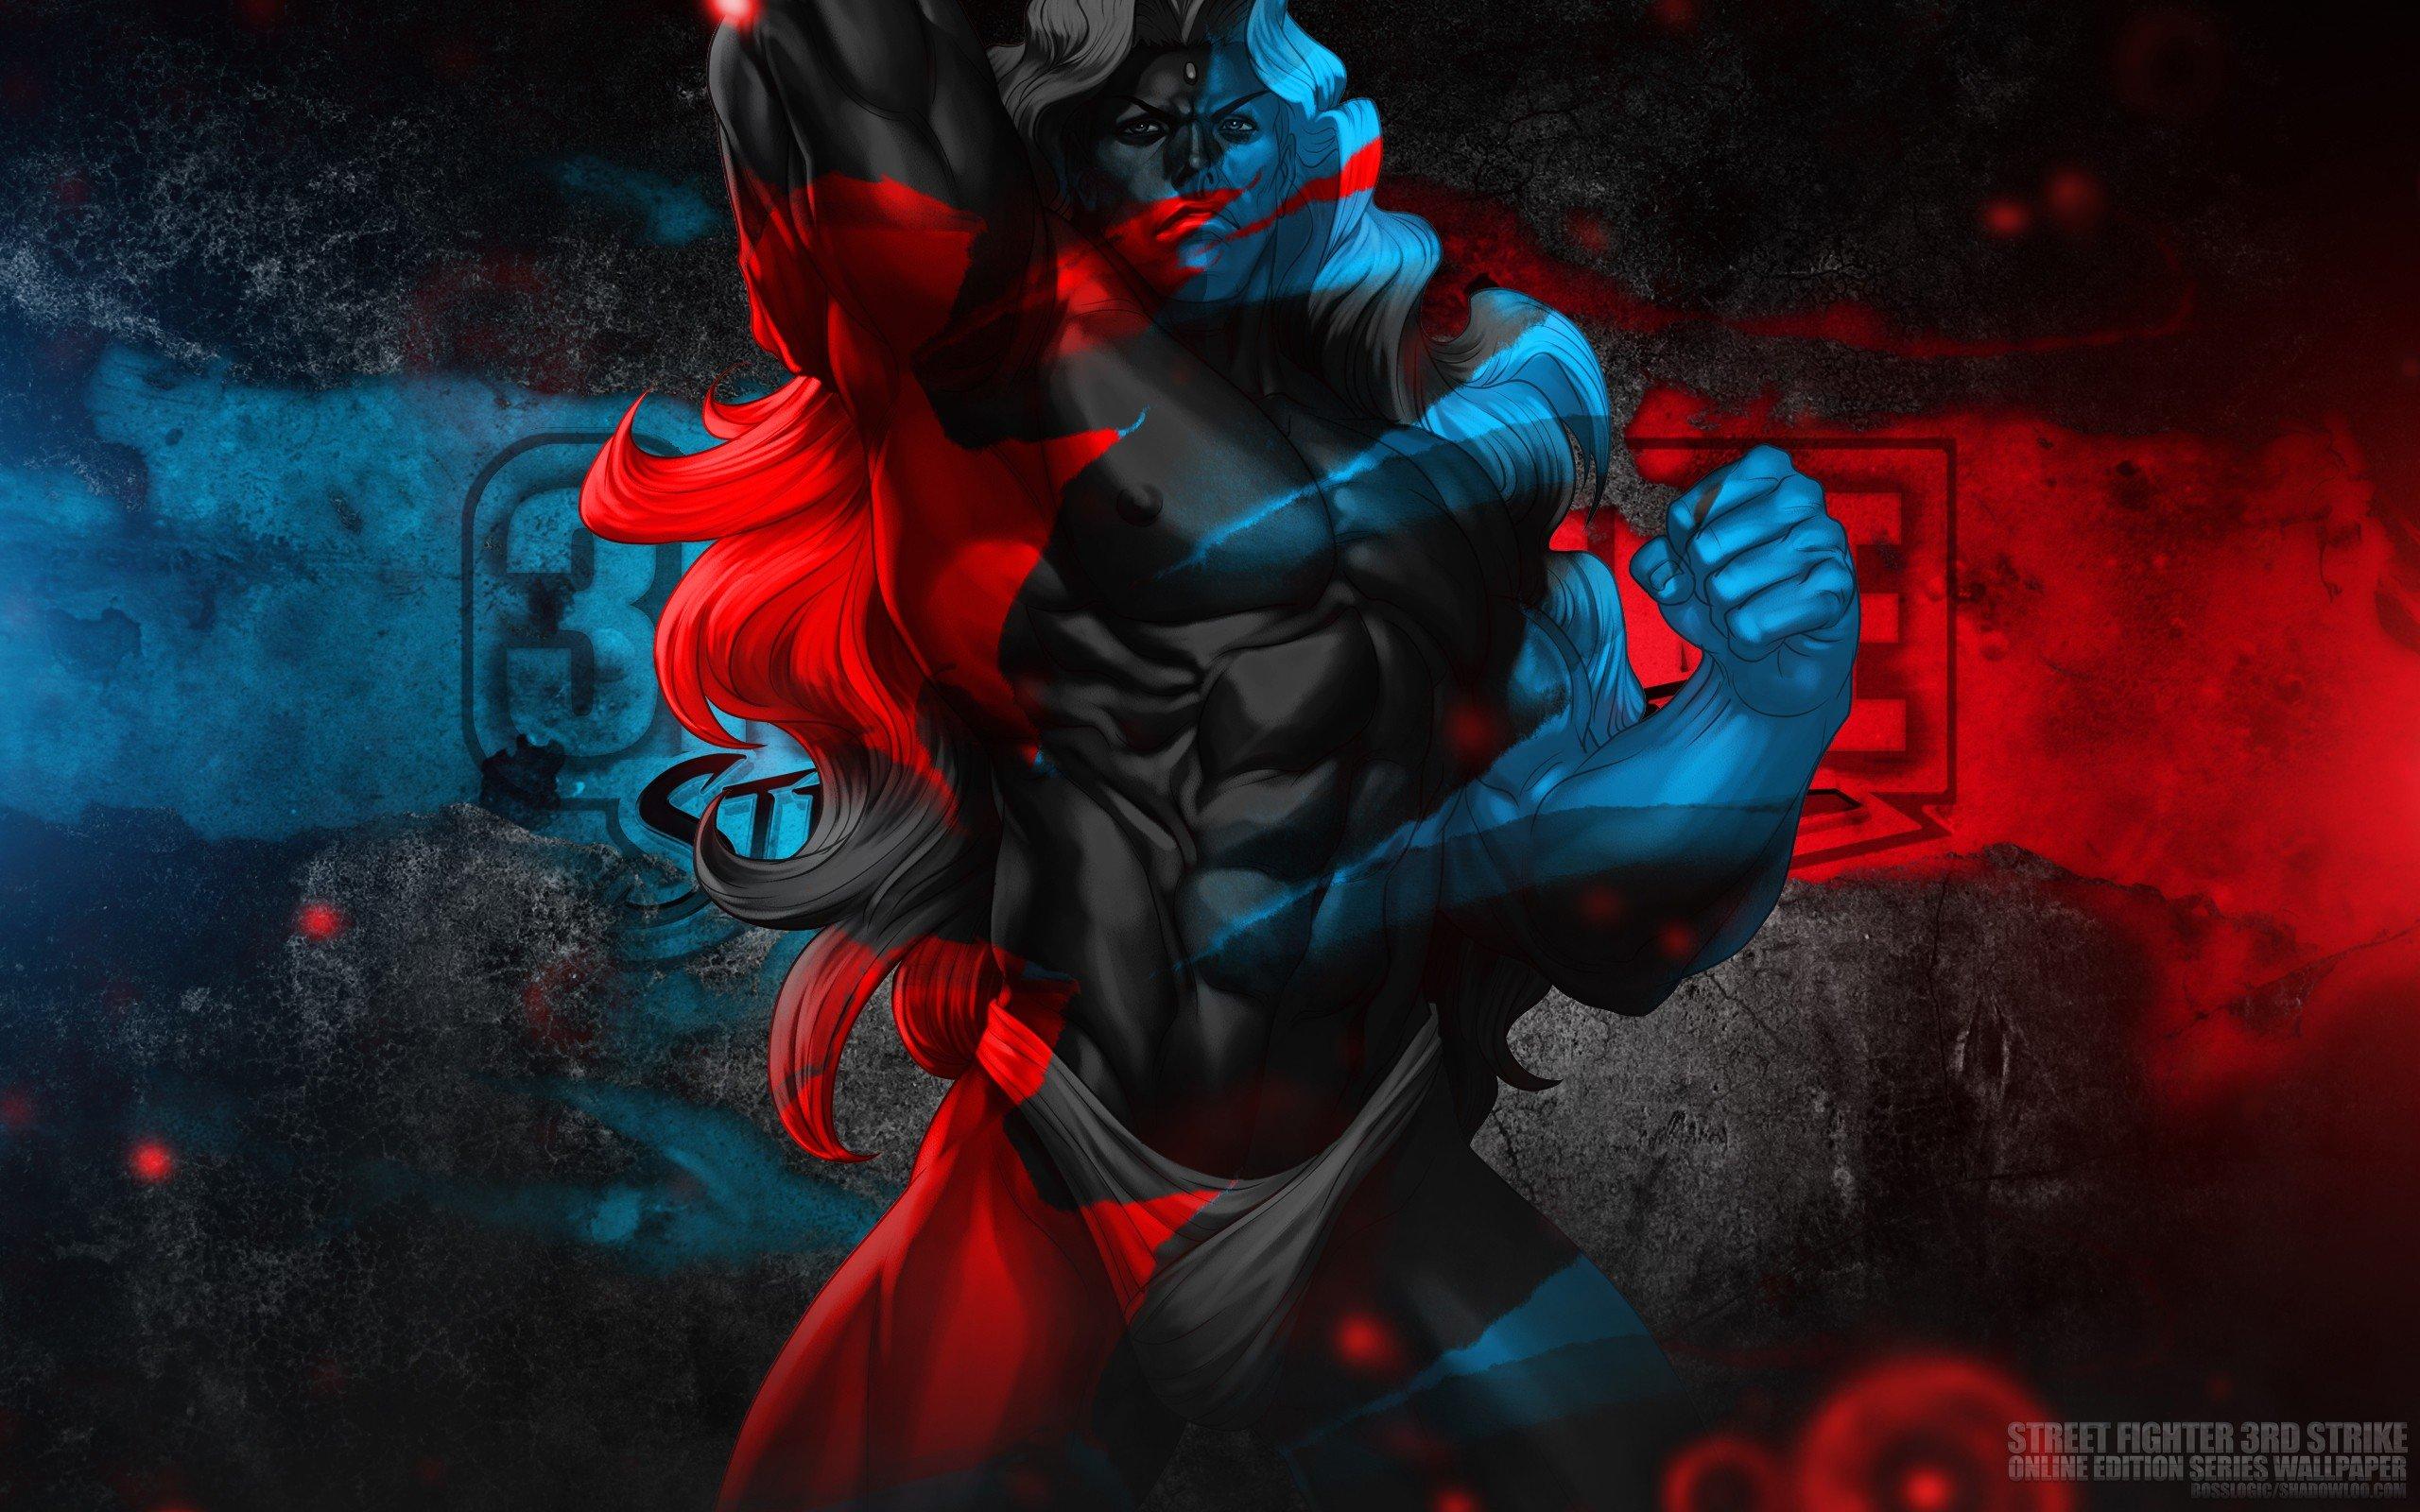 Bosslogic Artgerm Street Fighter Iii 3rd Strike Online Edition